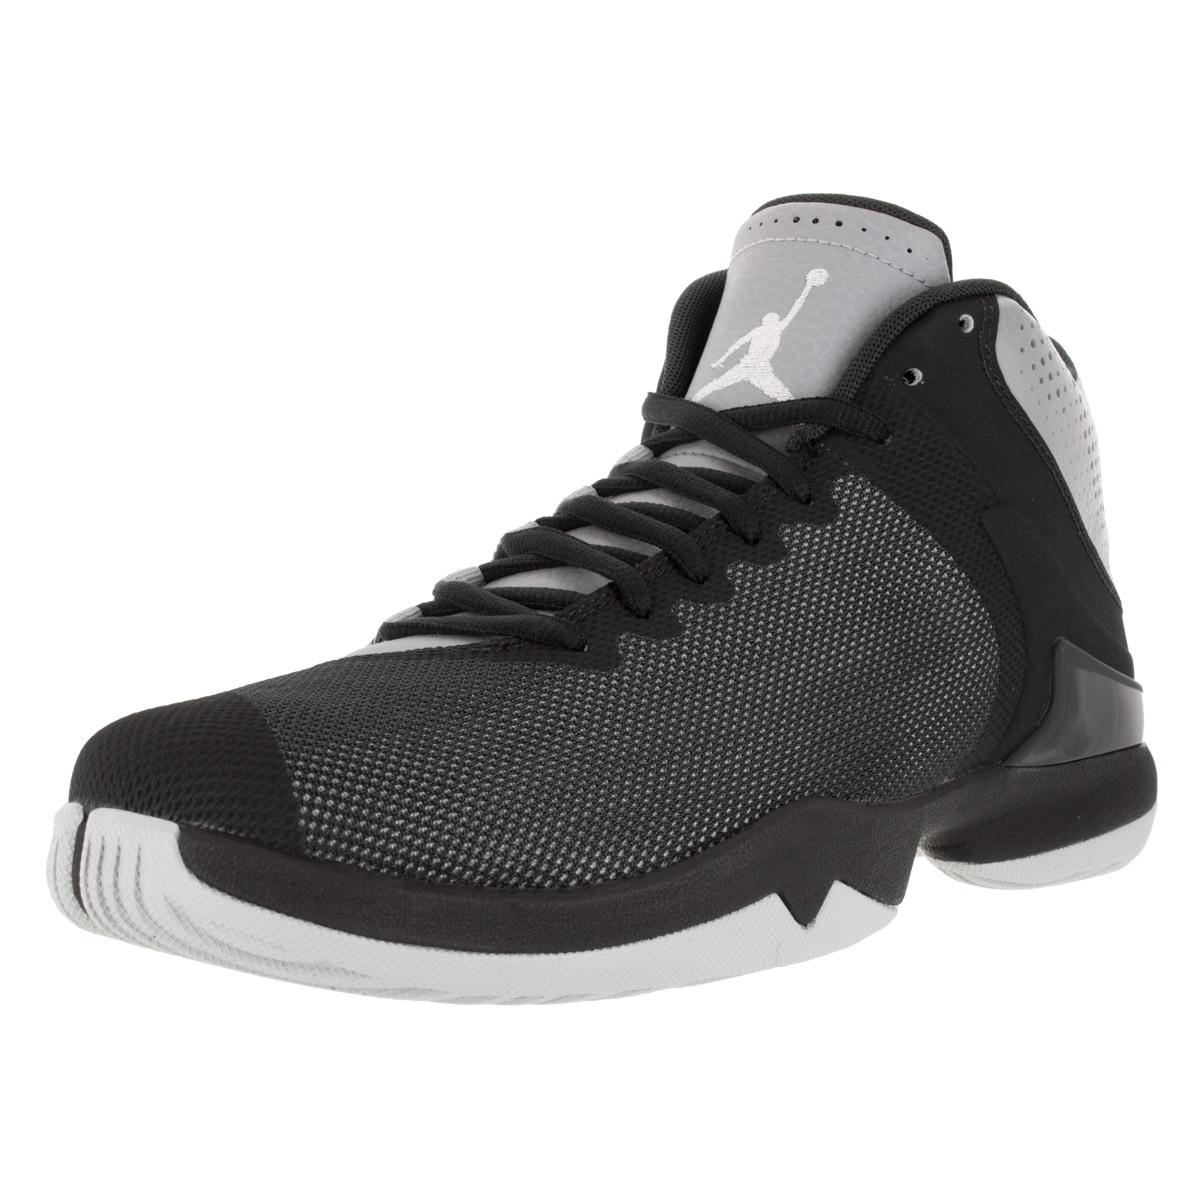 99b57fb71c62 Nike Jordan Men s Jordan Super.Fly 4 Po Wolf Grey White Anthracite Infrared  23 Basketball Shoe